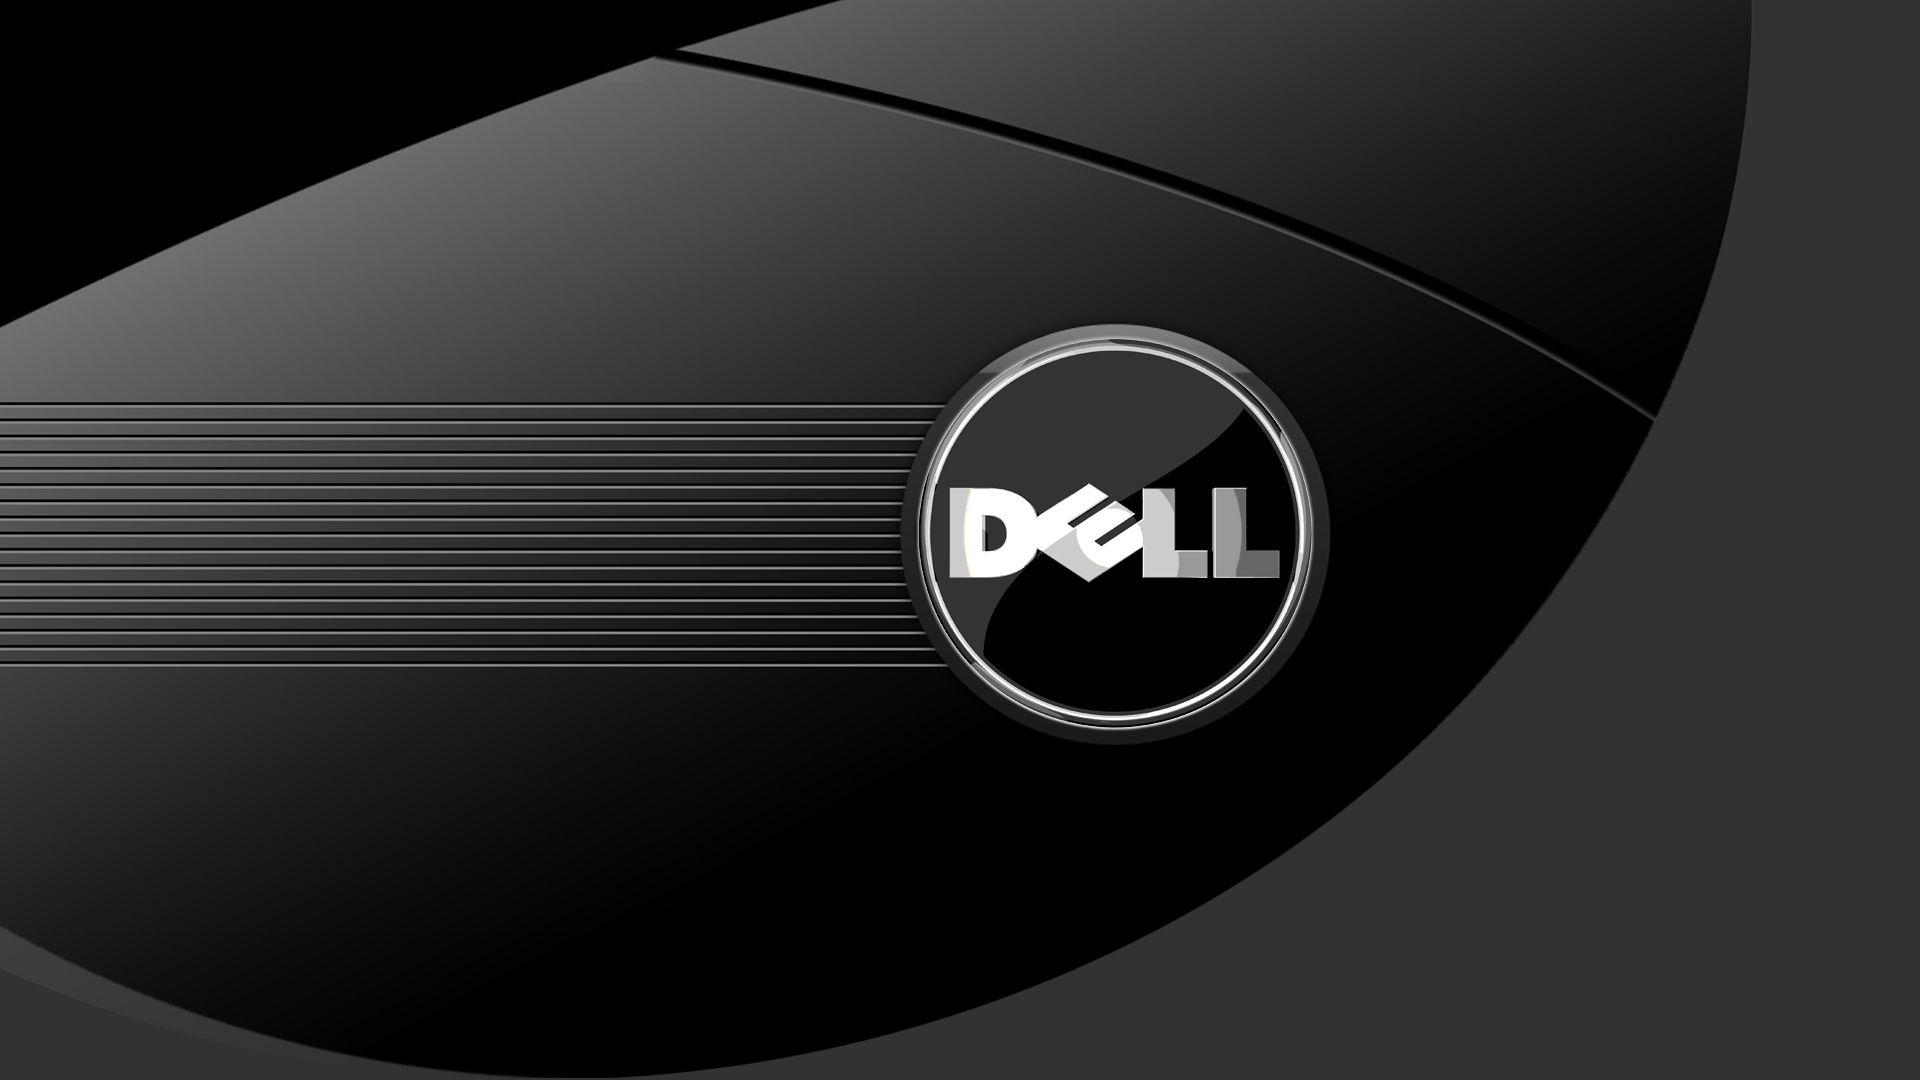 Dell jpg picture